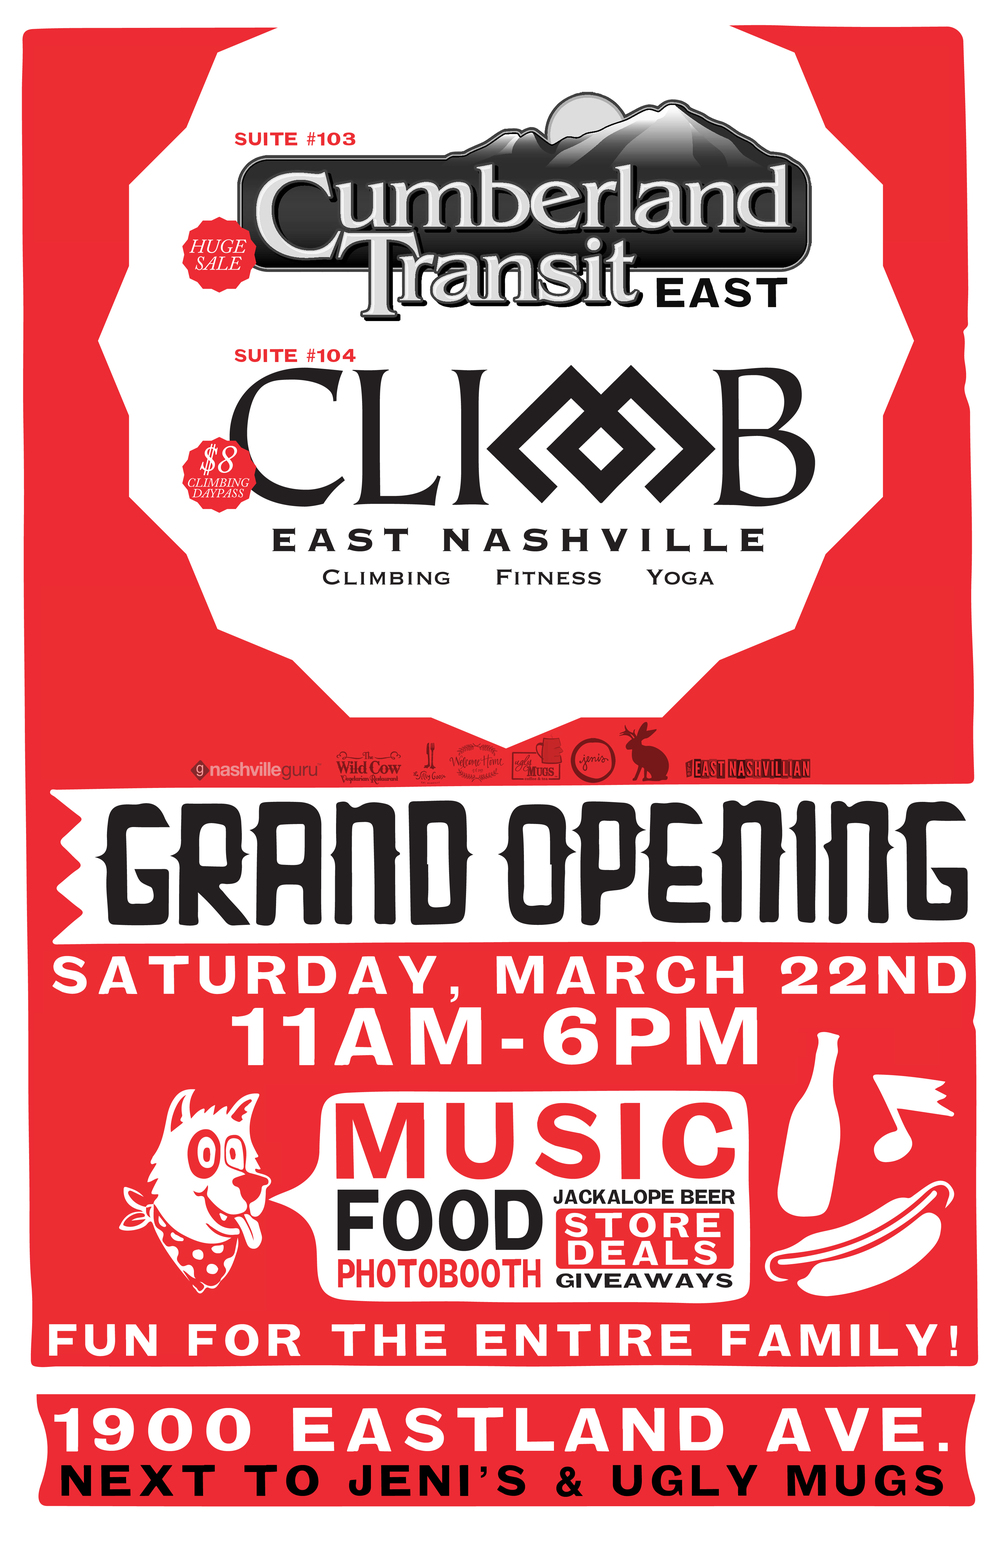 East grand opening poster.jpg